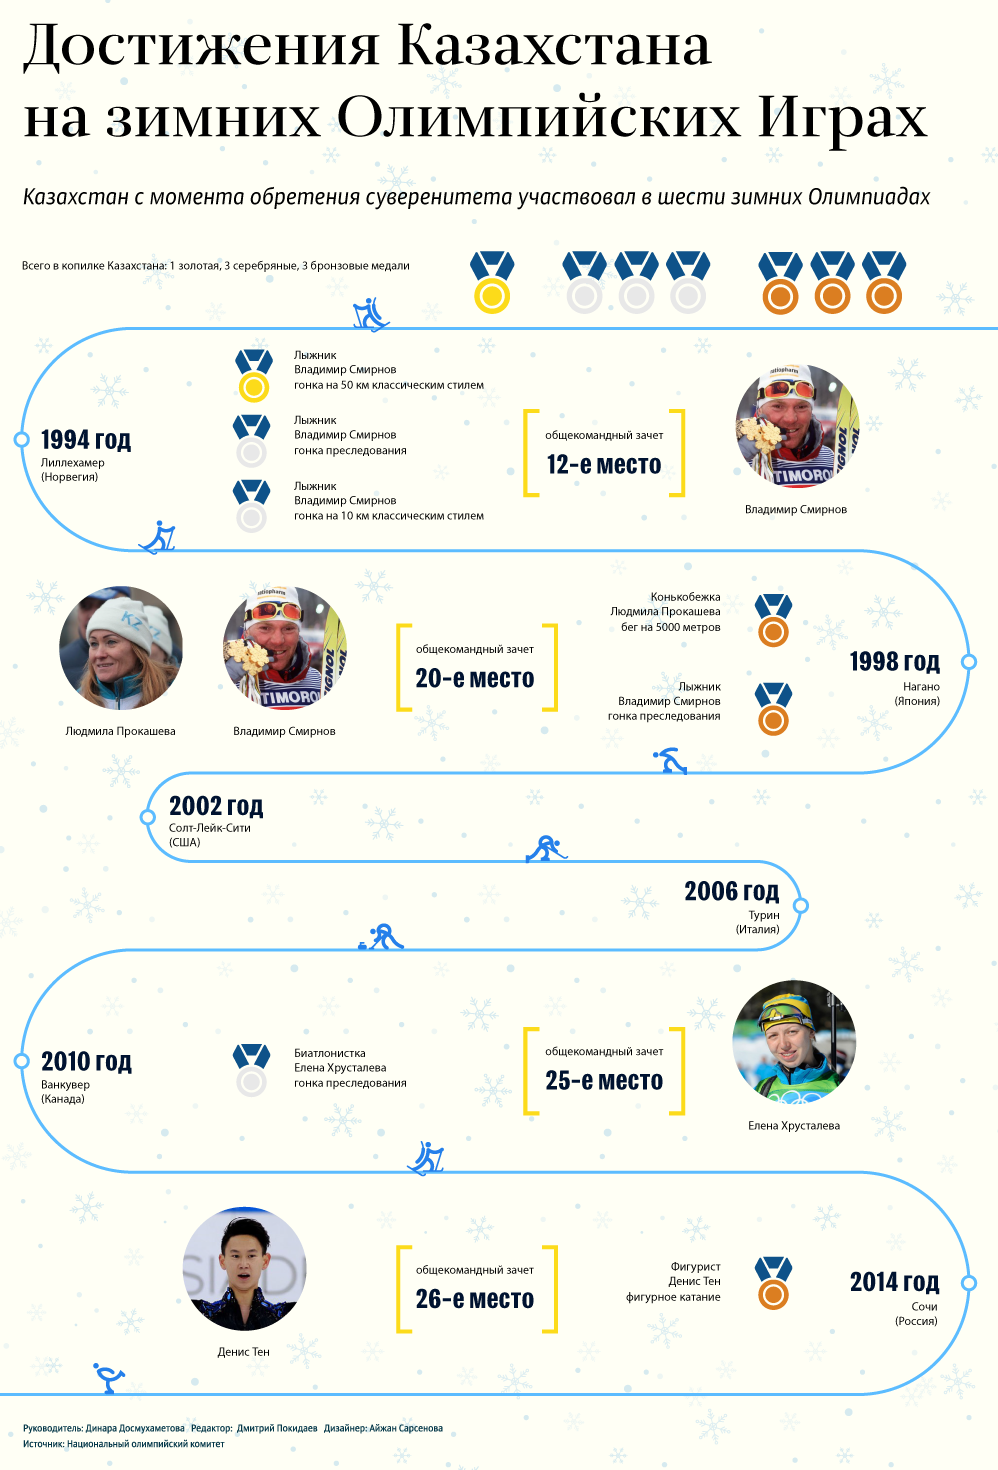 Достижения Казахстана на зимних Олимпиадах